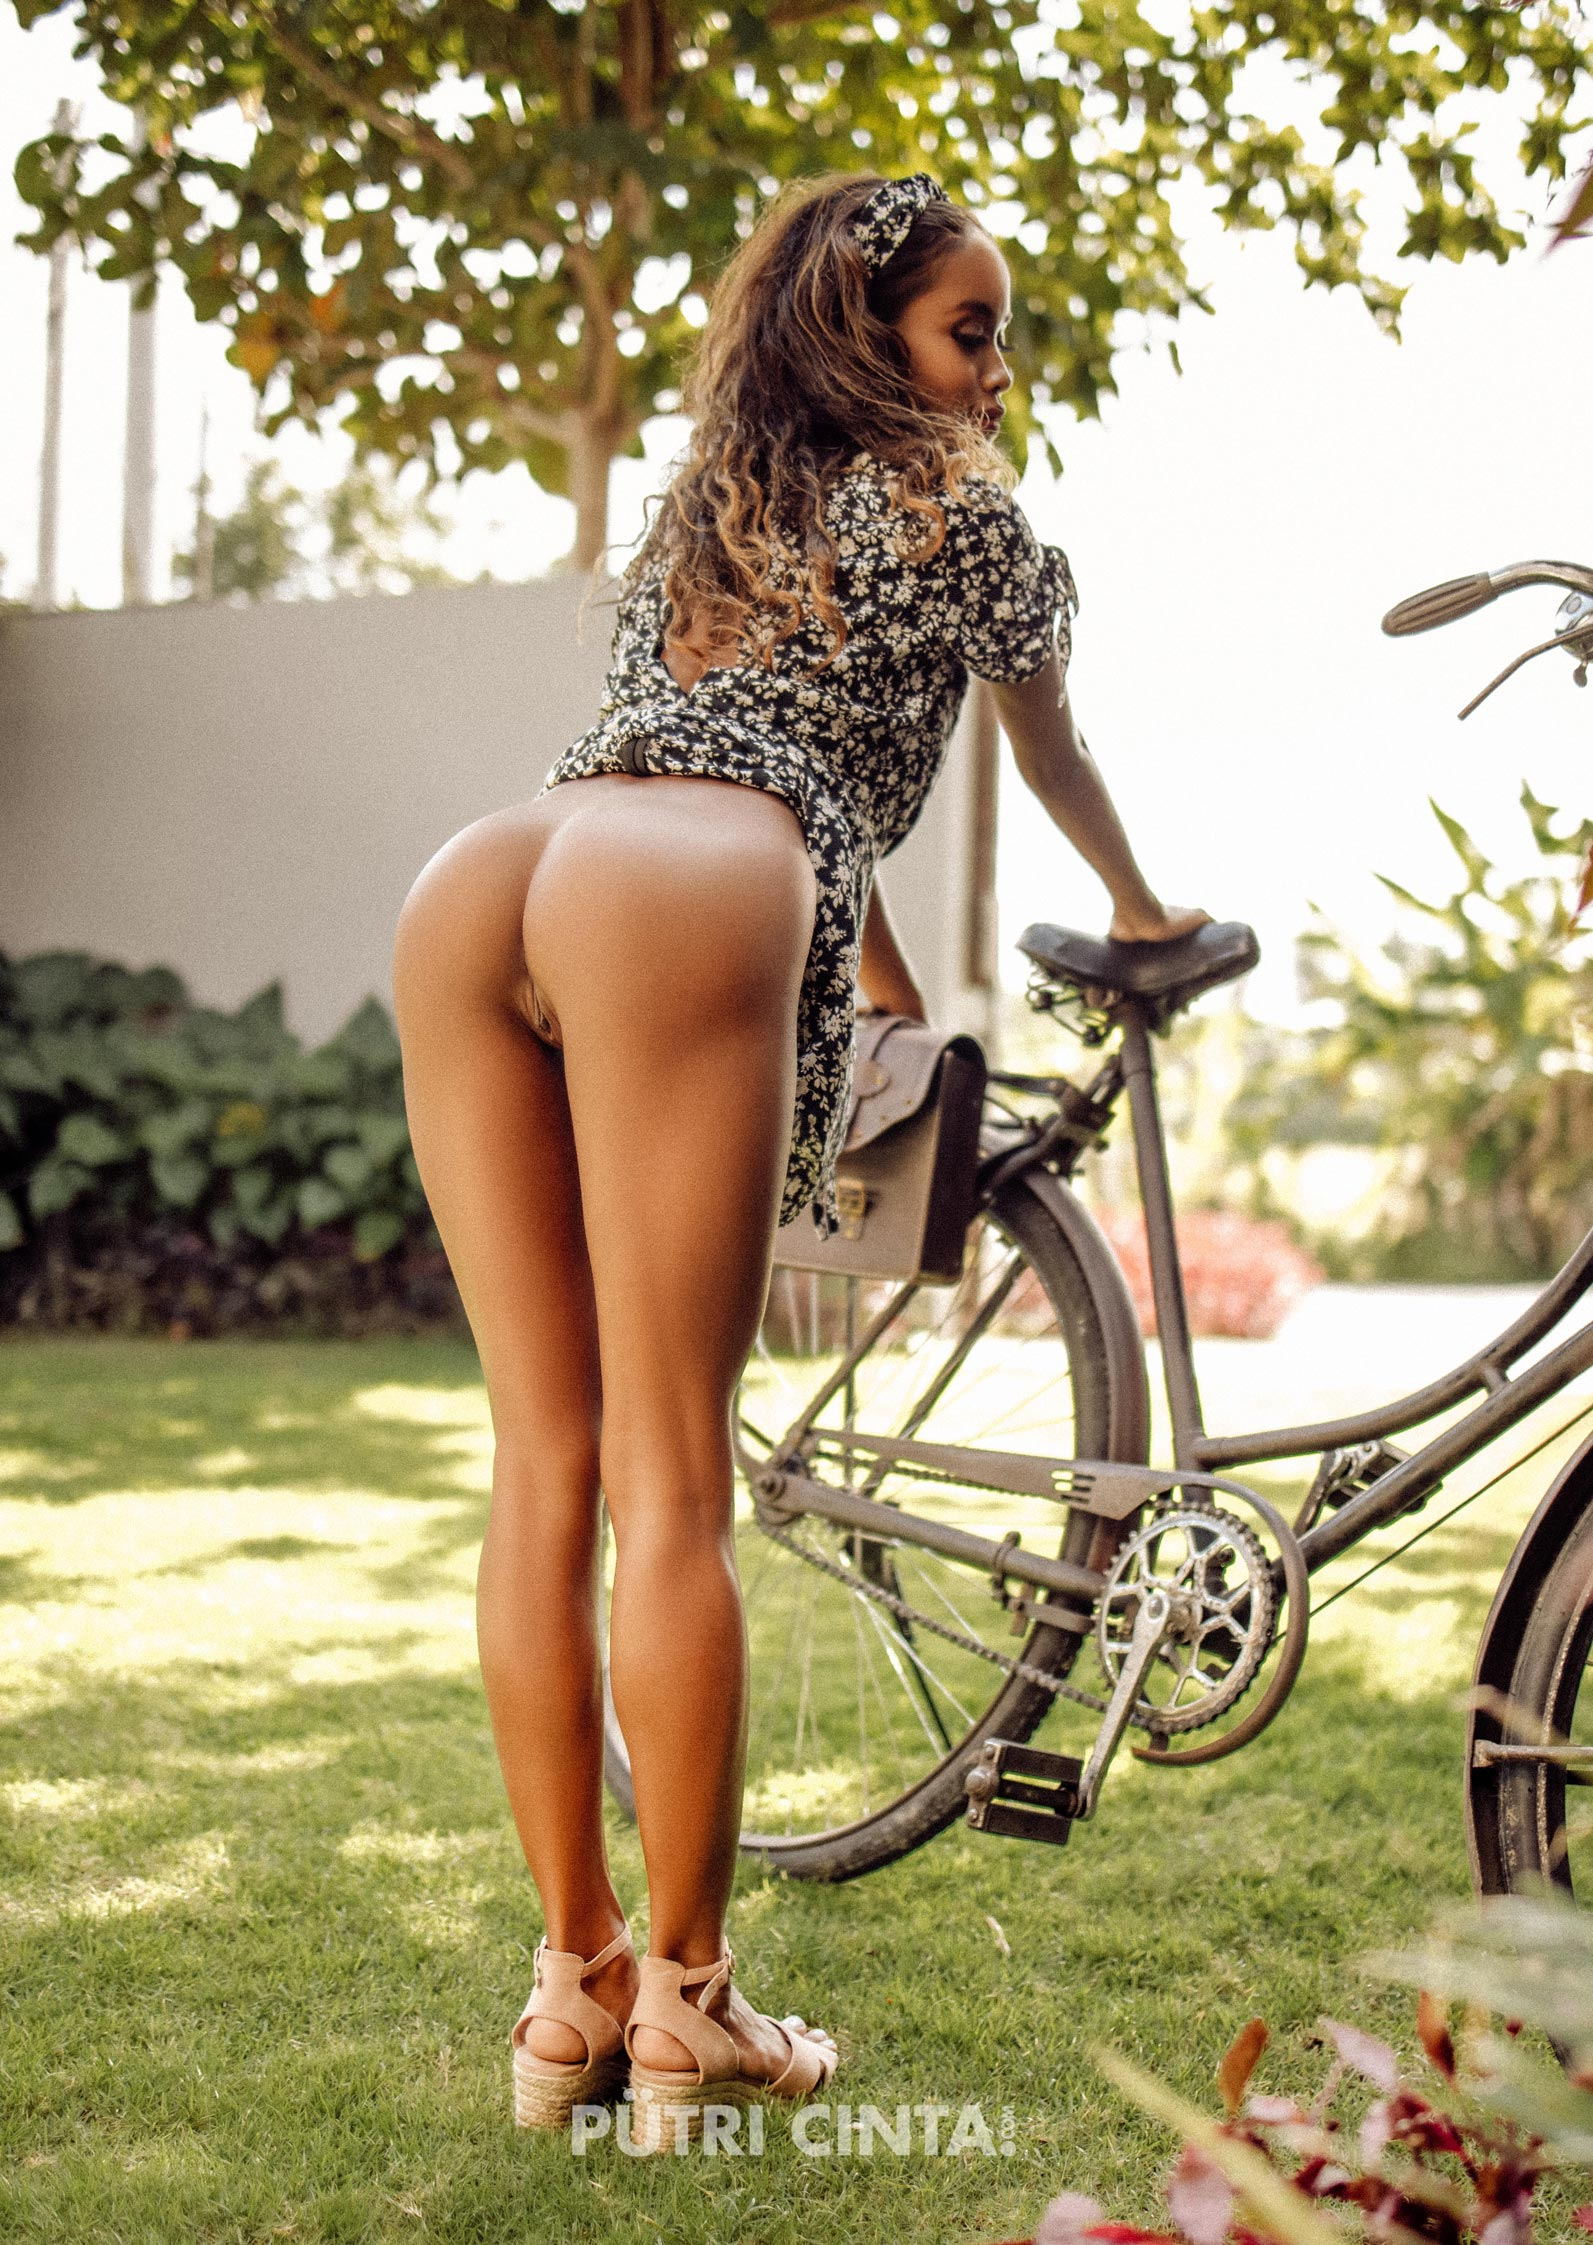 024-Putri-Cinta-Cycling-Commando-photoset-2.jpg